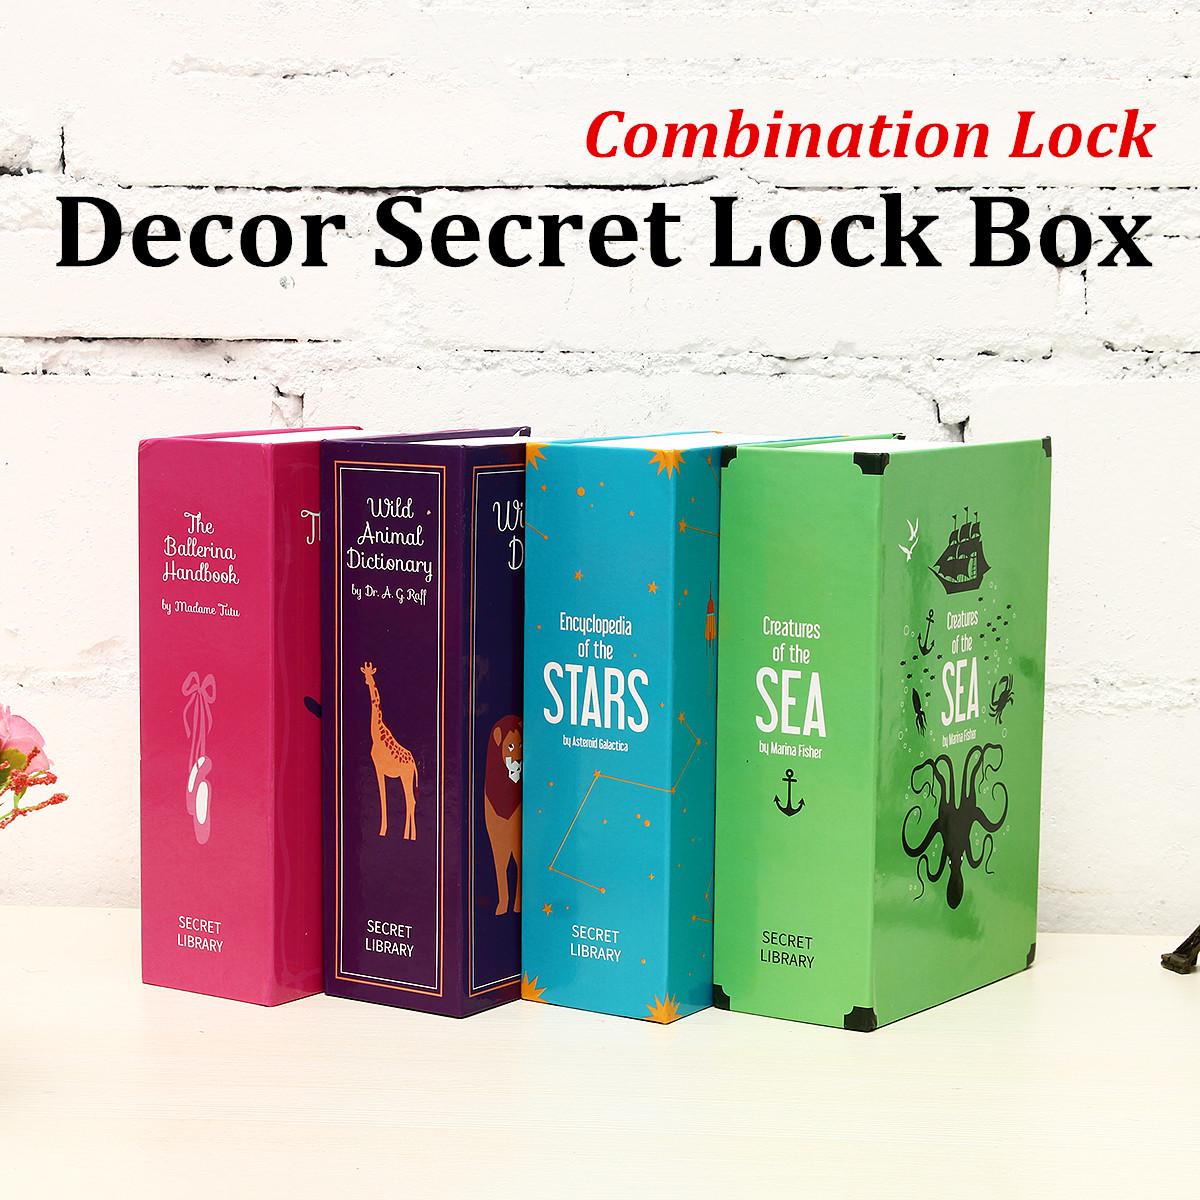 Security Box Dictionary Book Safe Cash Key Storage Combination Lock Secret Case Hidden Home Craft